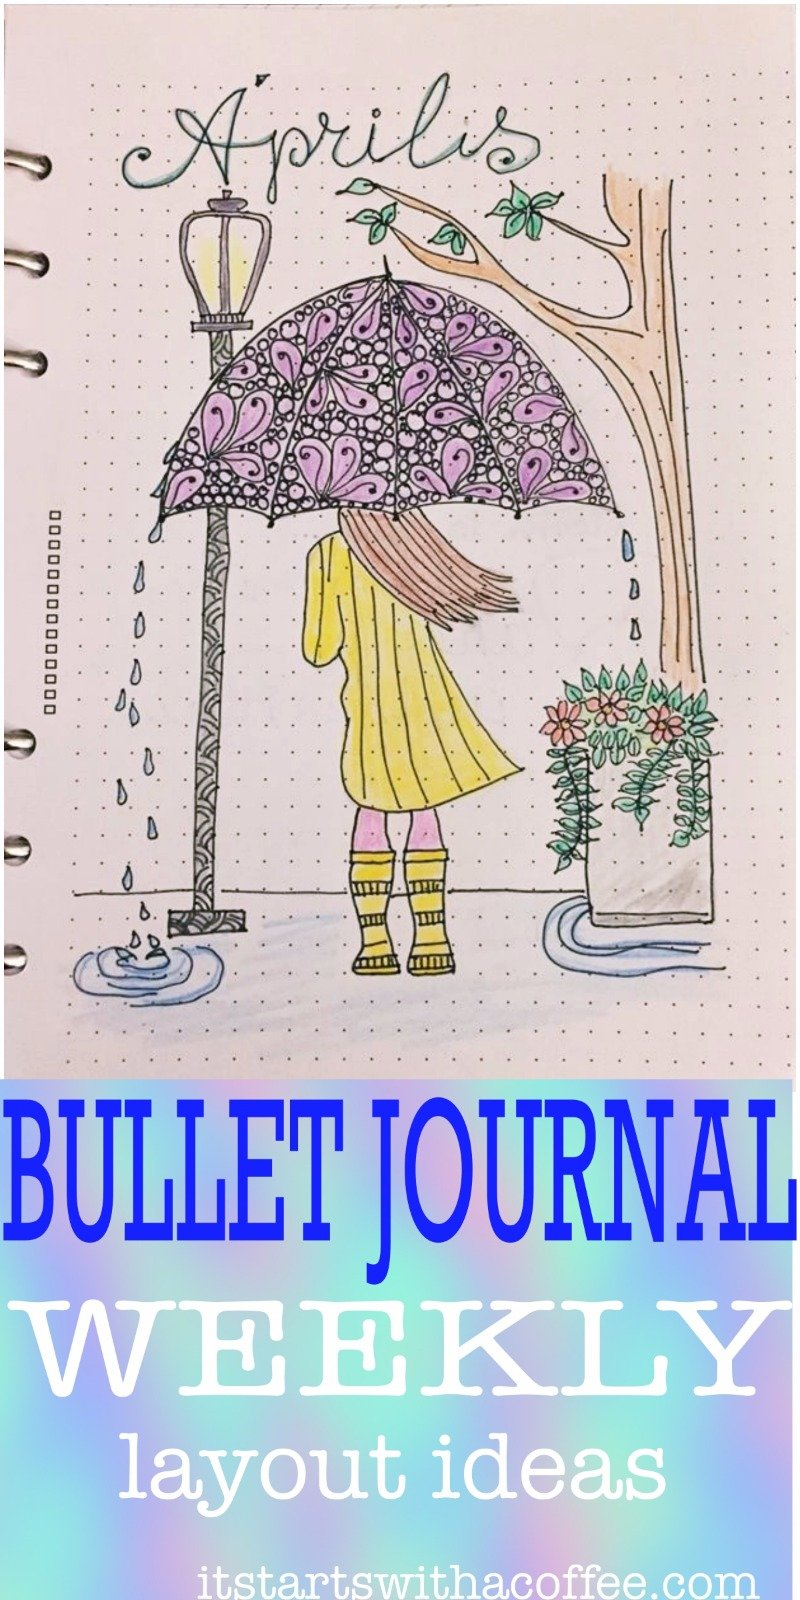 Bullet journal weekly planner - April 2018 - itstartswithacoffee.com #april #coverpage #bulletjournal #bujo #weekly #weeklyplanner #bulletjournaling #bujojunkies #bujolove #showmeyourplanner #bujoinspire #bulletjournallove #bulletjournalcommunity #planning #planneraddict #bulletjournaljunkies #planwithme #itstartswithacoffee.com